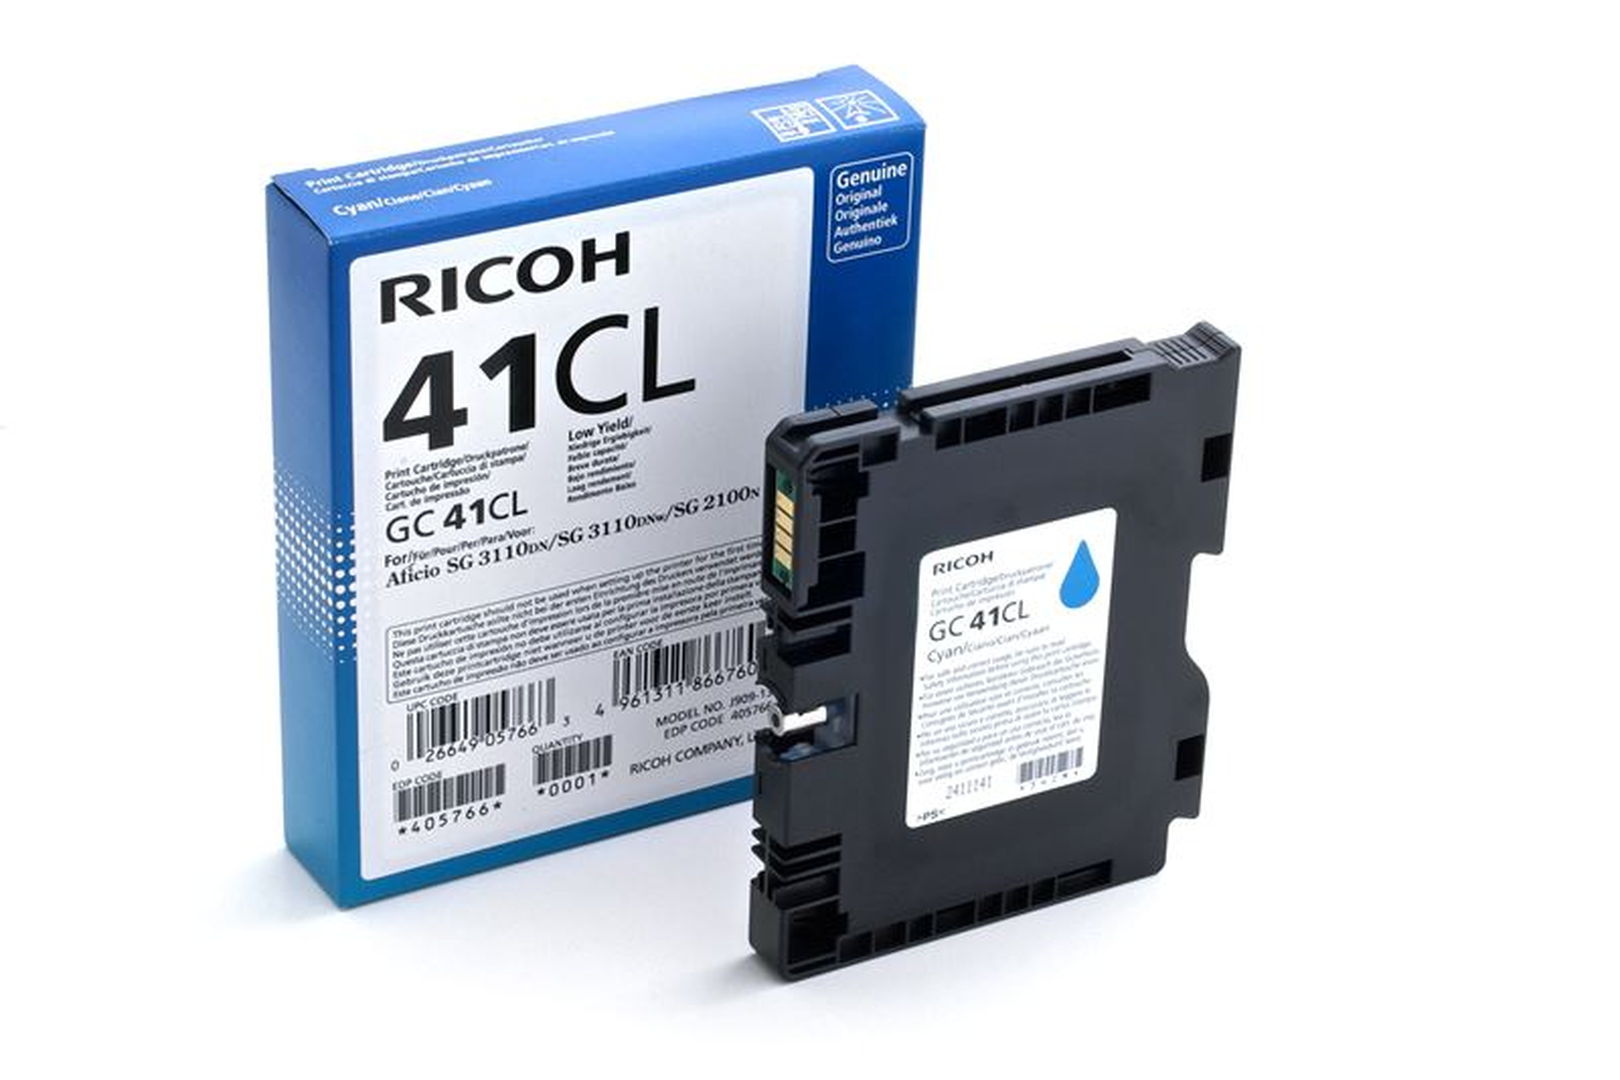 Ricoh Gel-Kartusche cyan , 405766